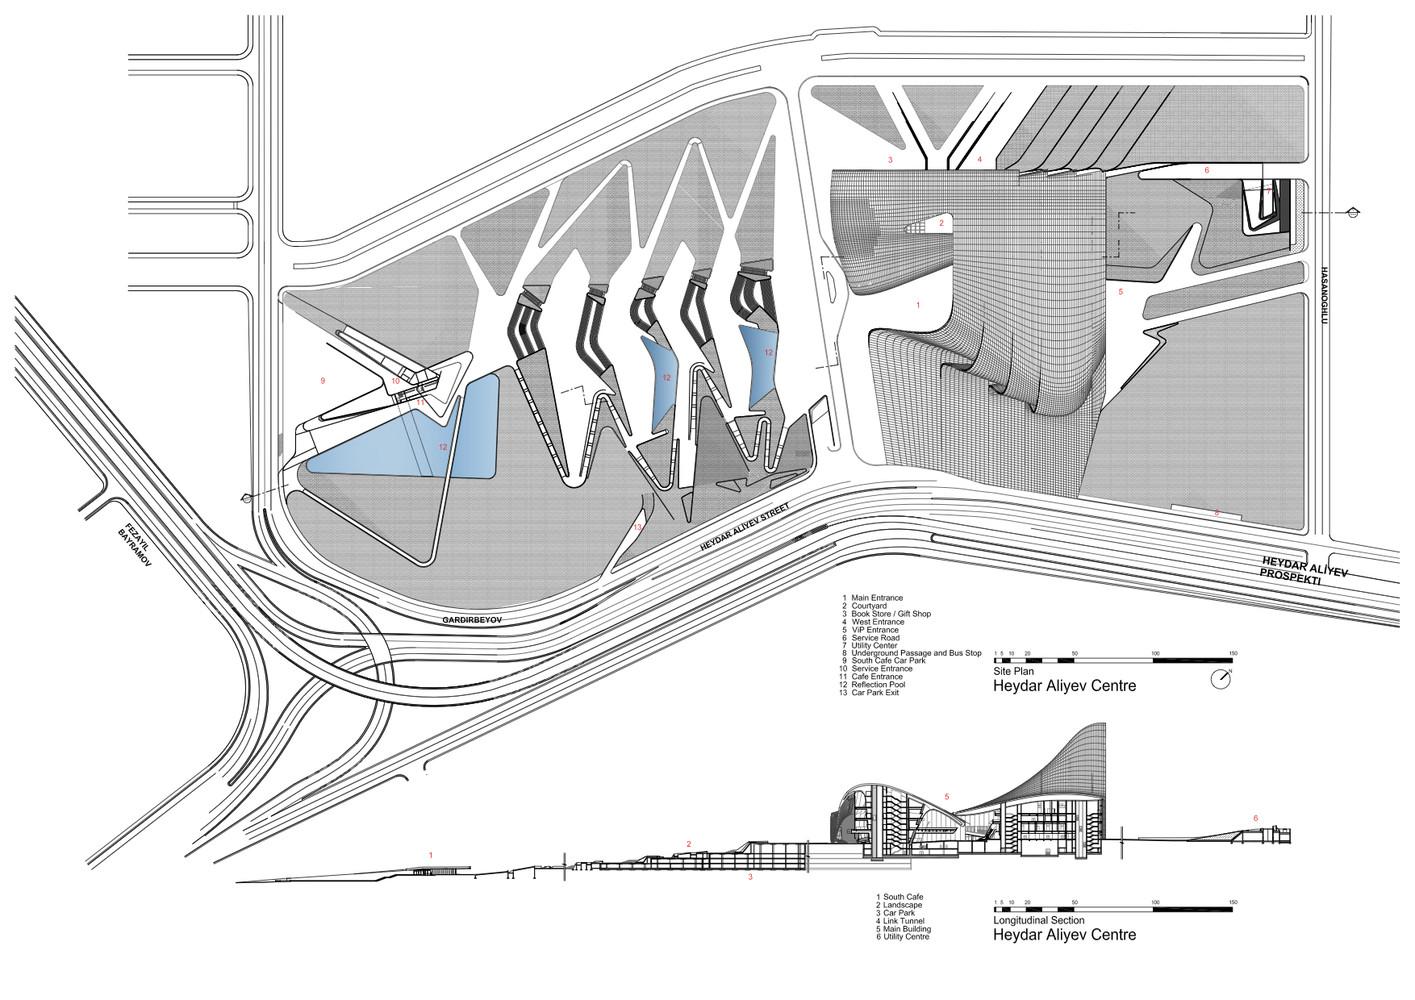 Heydar Aliyev Center-Zaha Hadid Architects-IGS Nostalgia-Architectural Photography-39